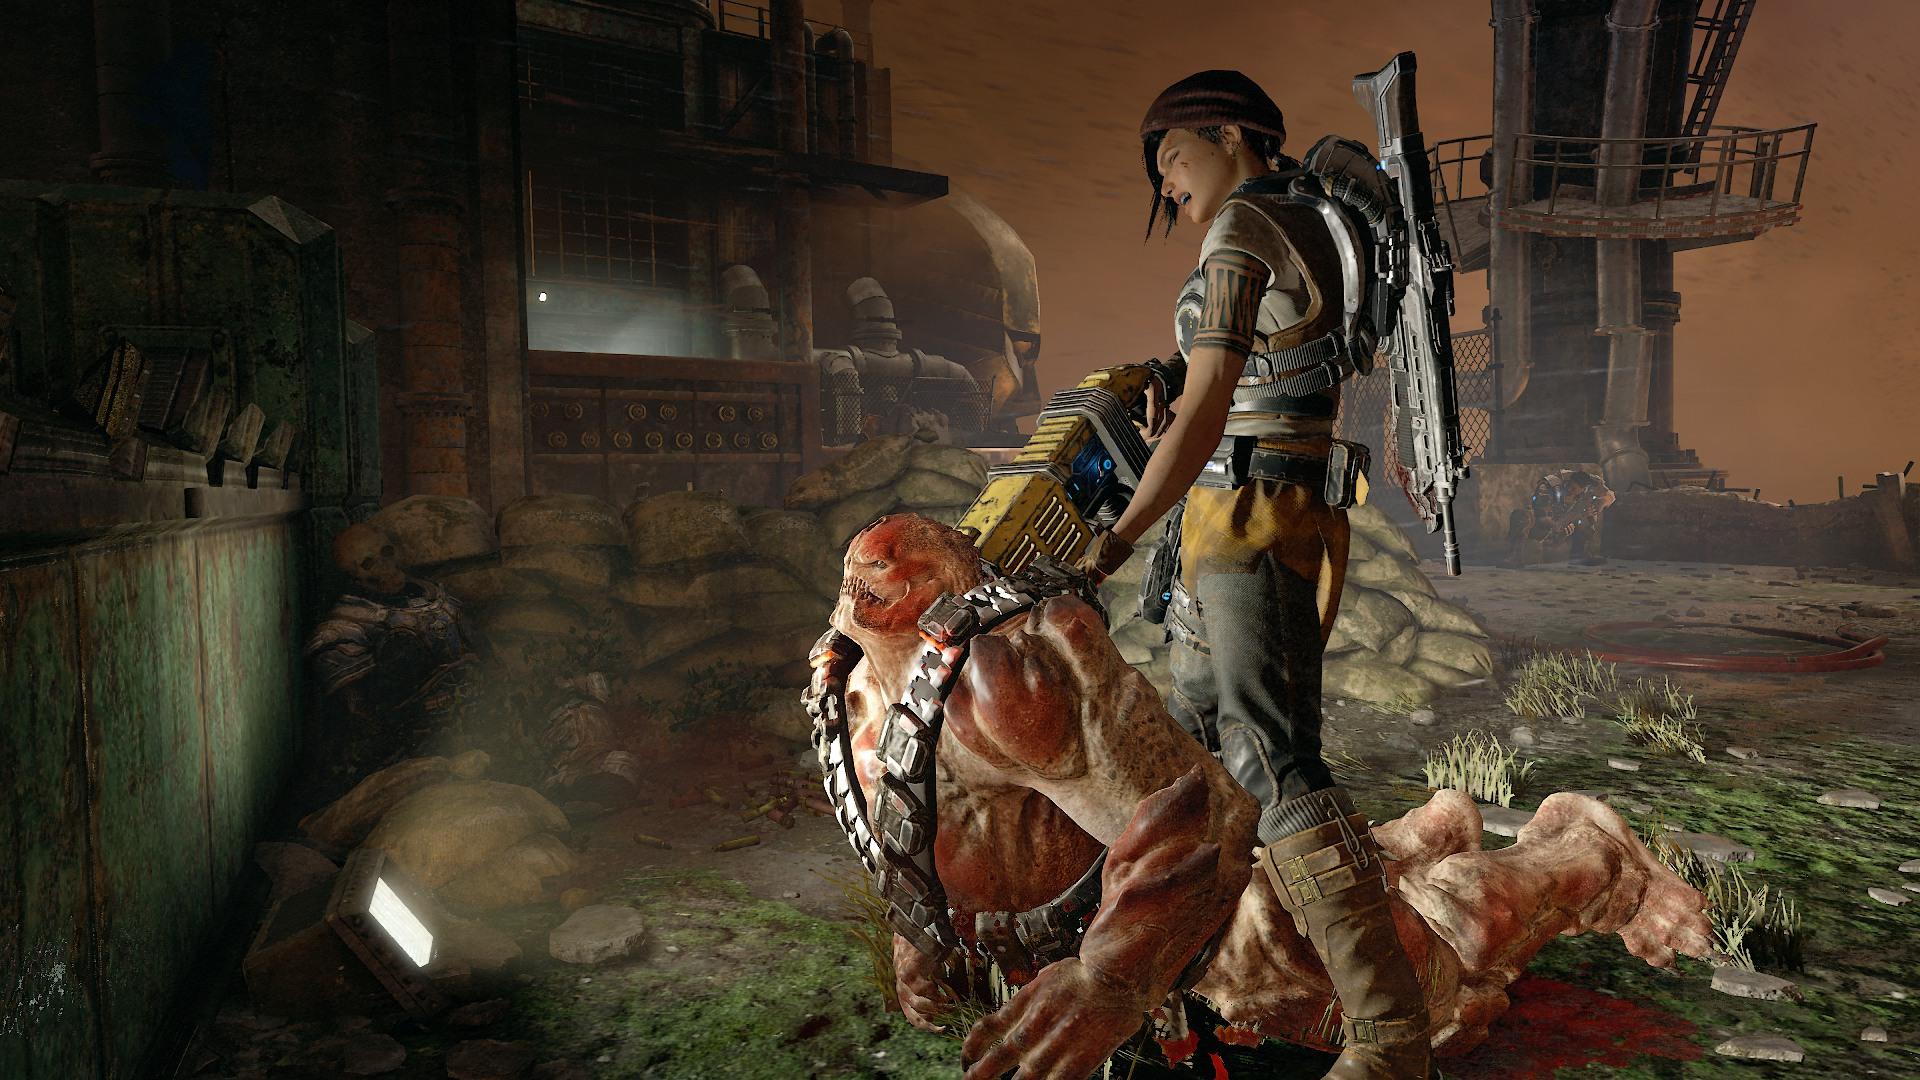 Gears Of War 4 Hd Wallpaper Background Image 1920x1080 Id